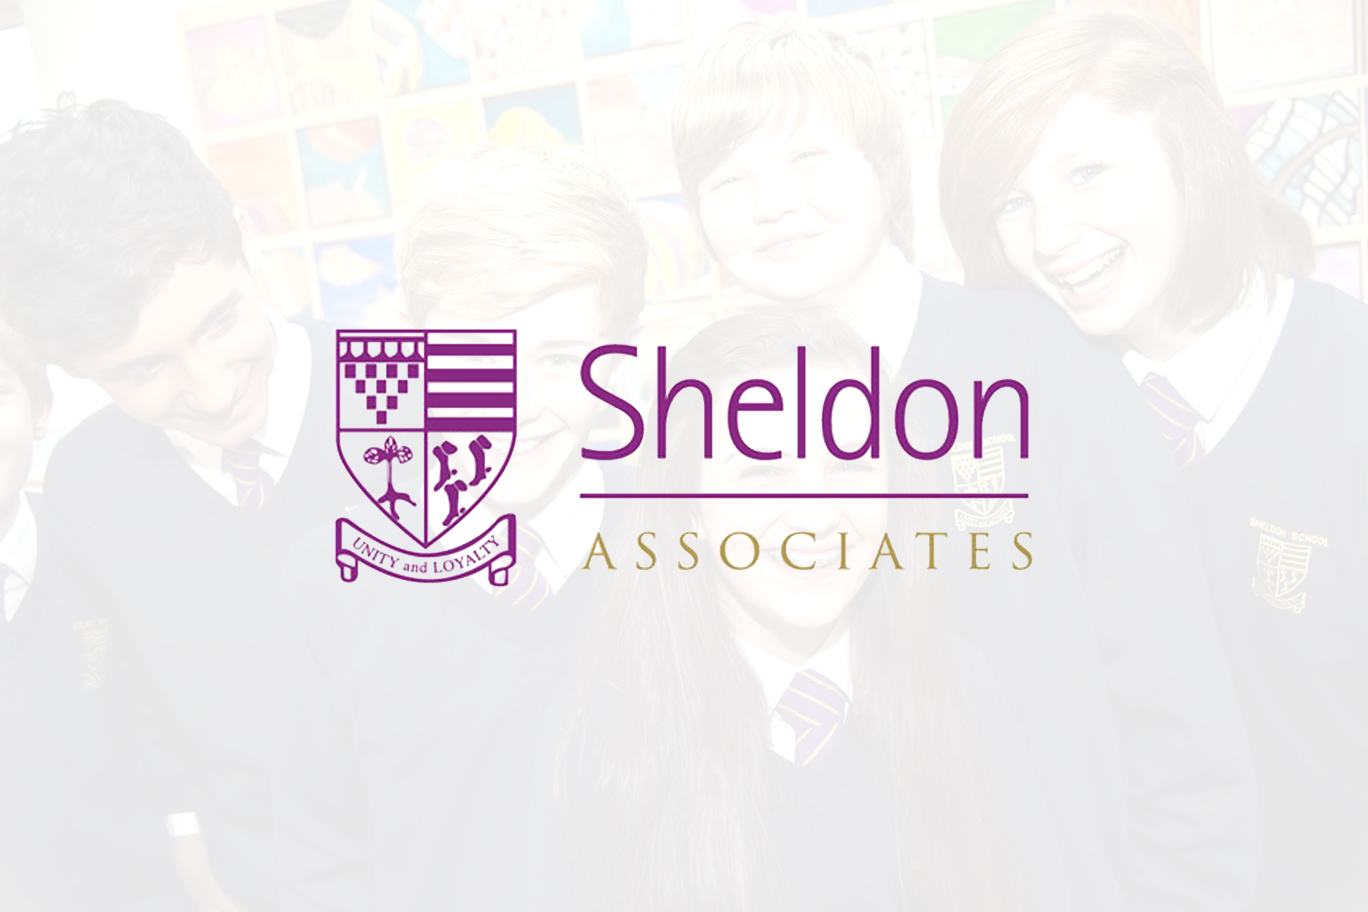 Sheldon Assosciates Image